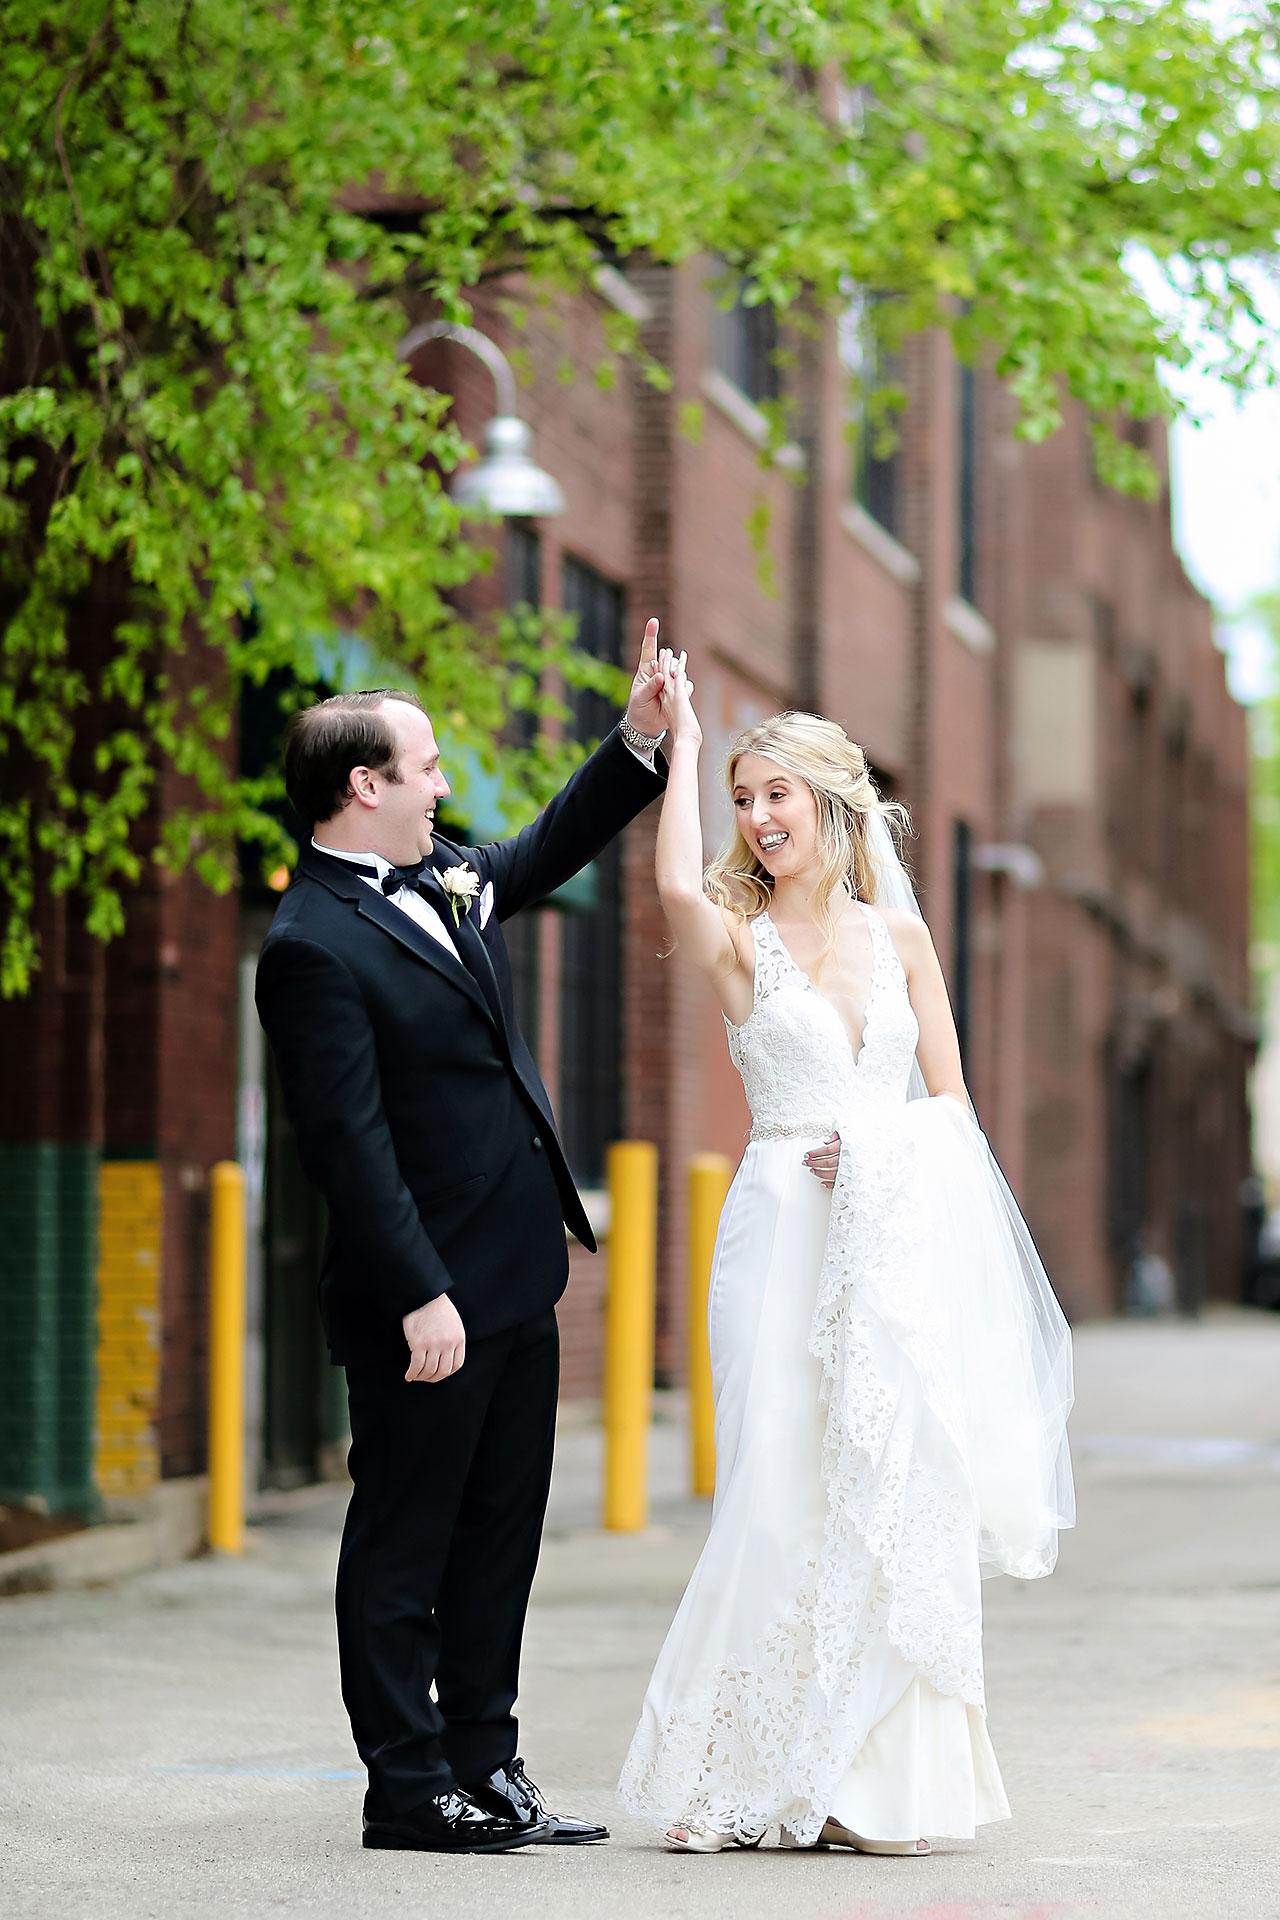 Allison Jeff Union Station Crowne Plaza Indianapolis wedding 137